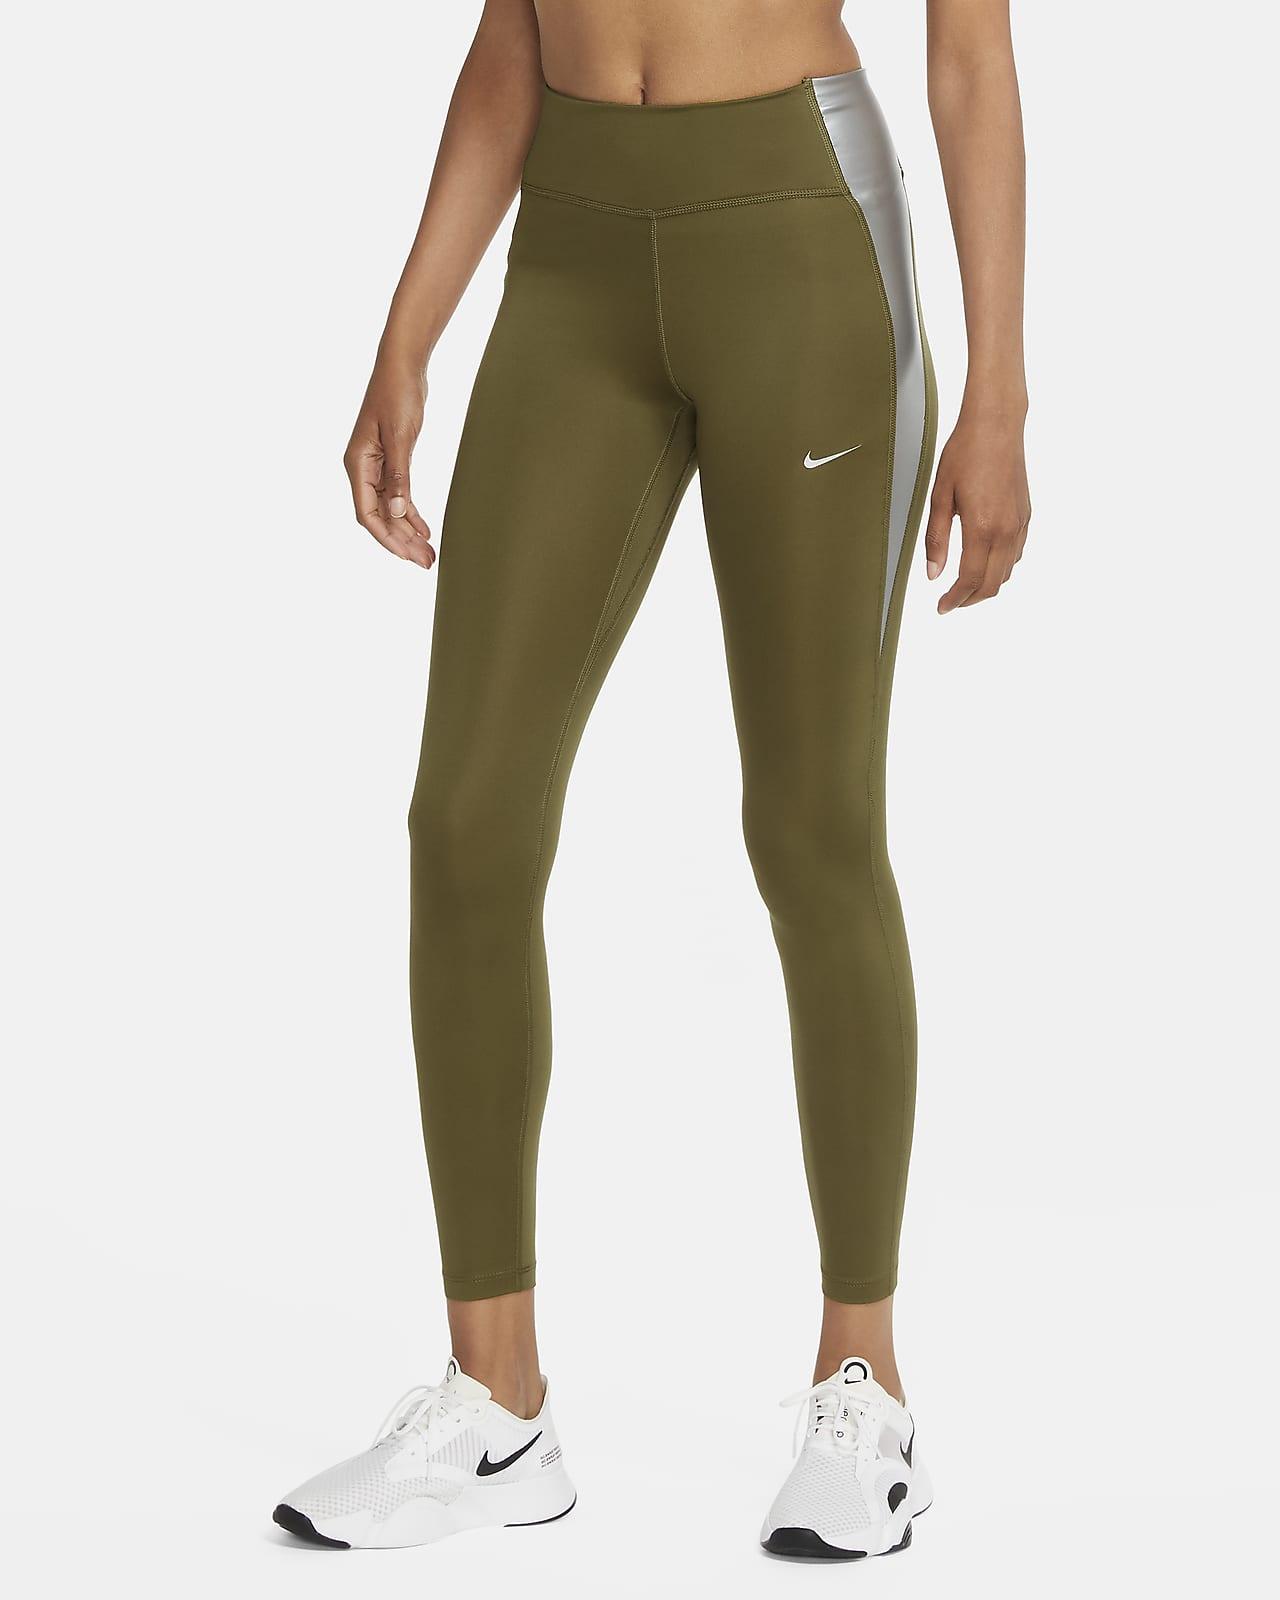 Nike One Women's Leggings